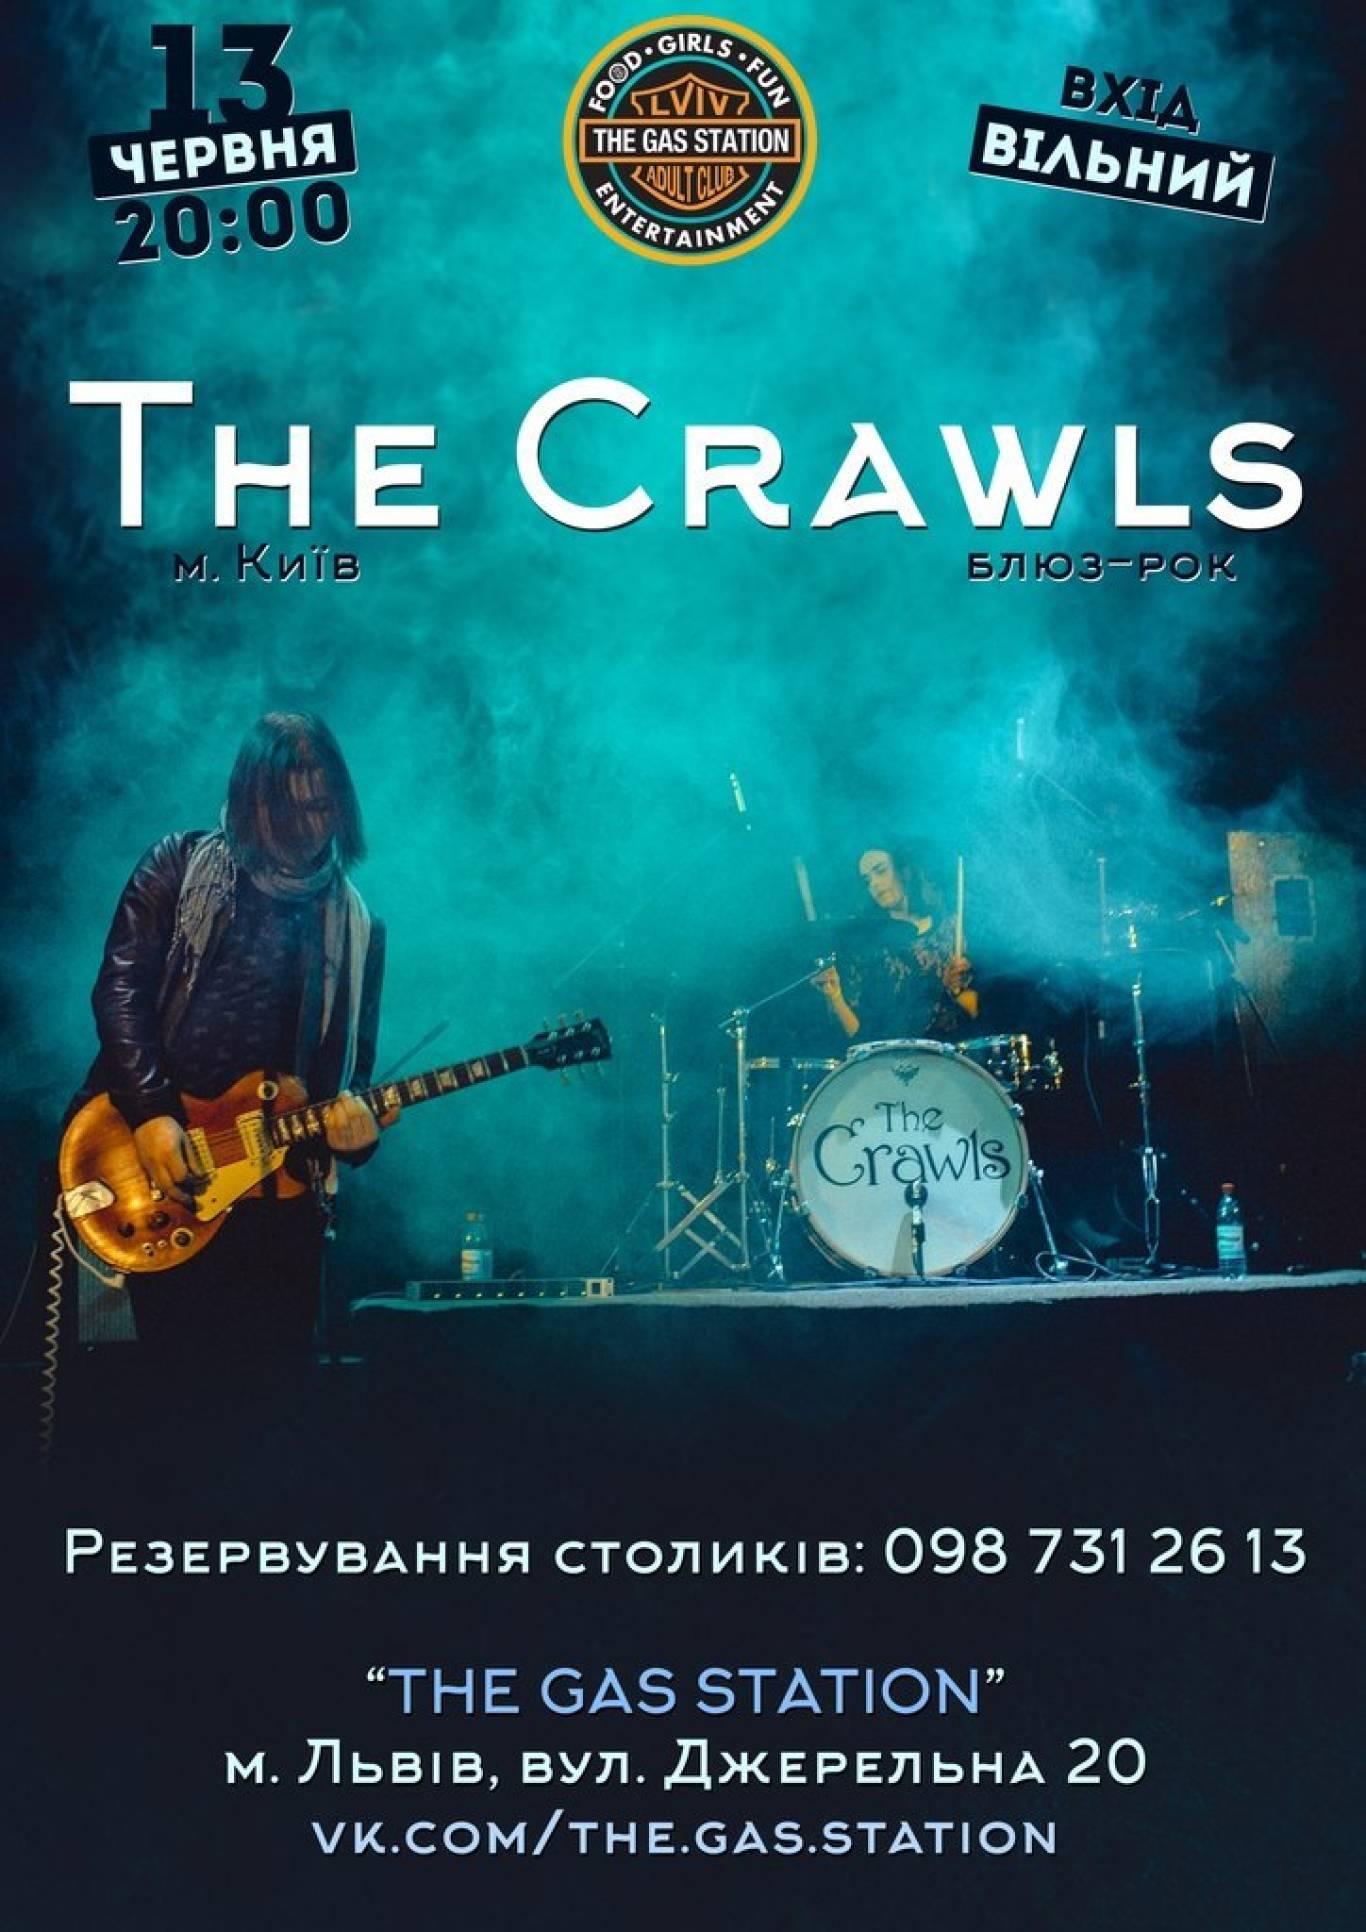 Виступ київського гурту The Crawls